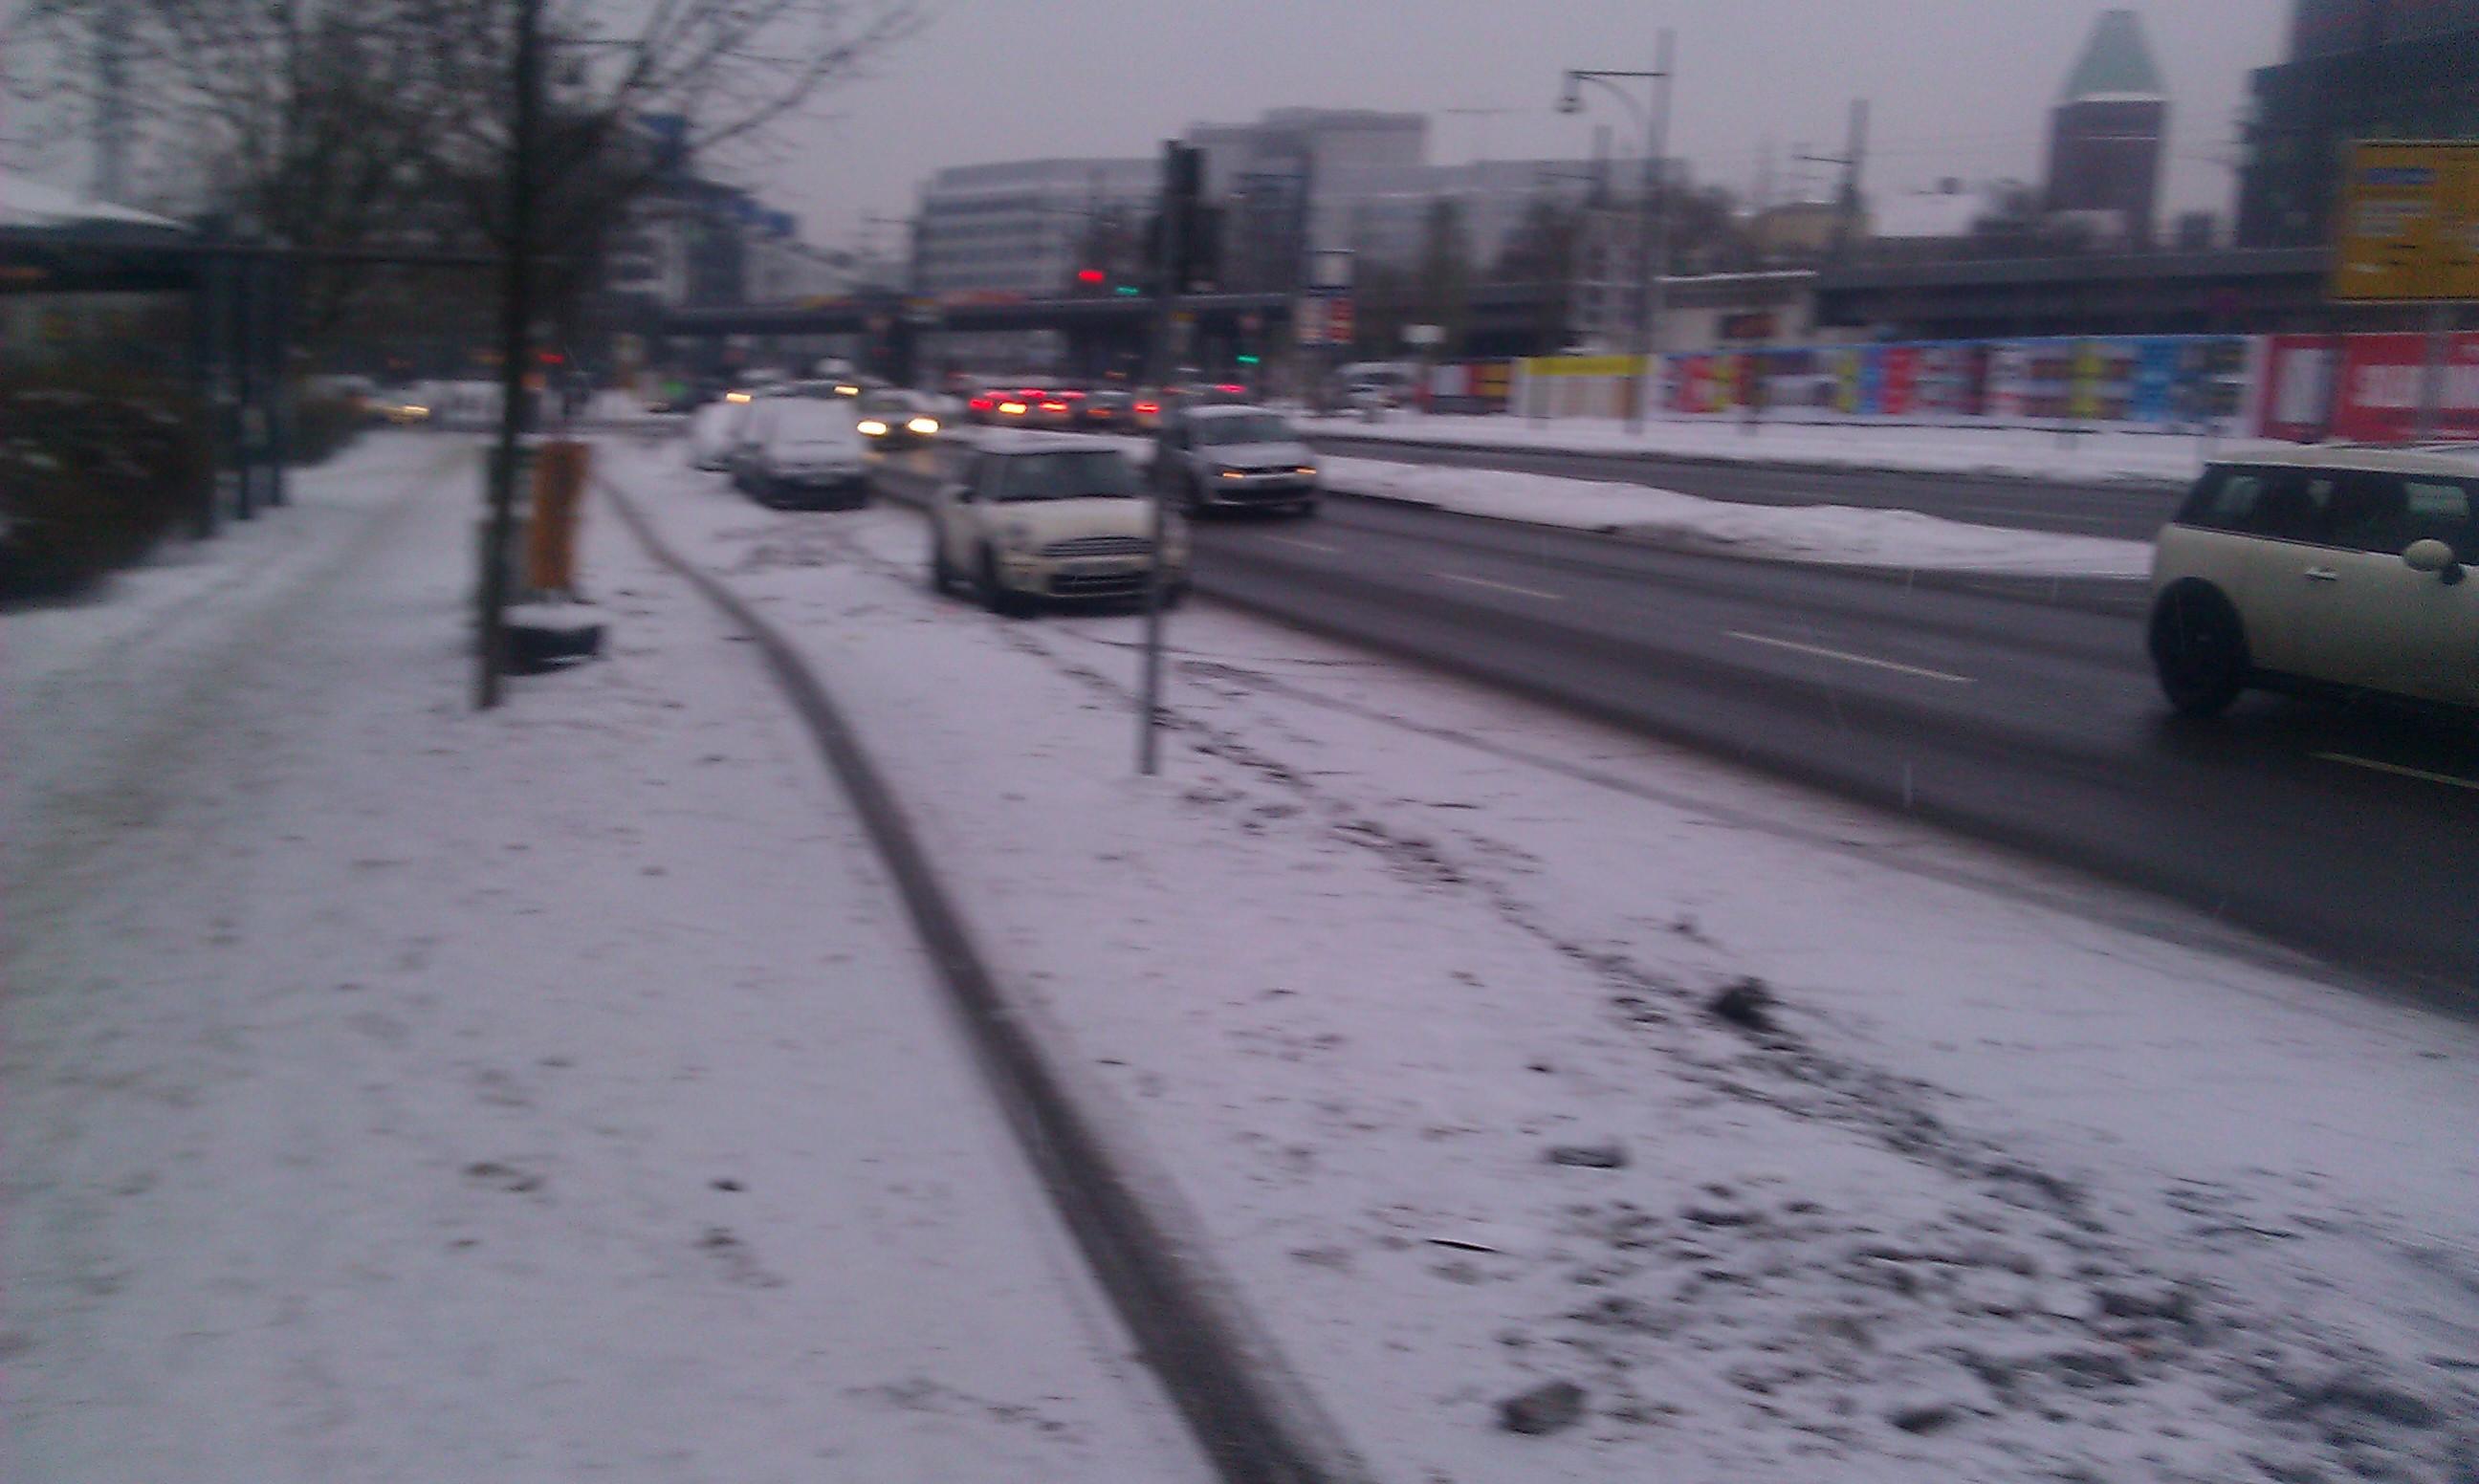 Dezember 2012 in Berlin, Foto: e-Rad Hafen